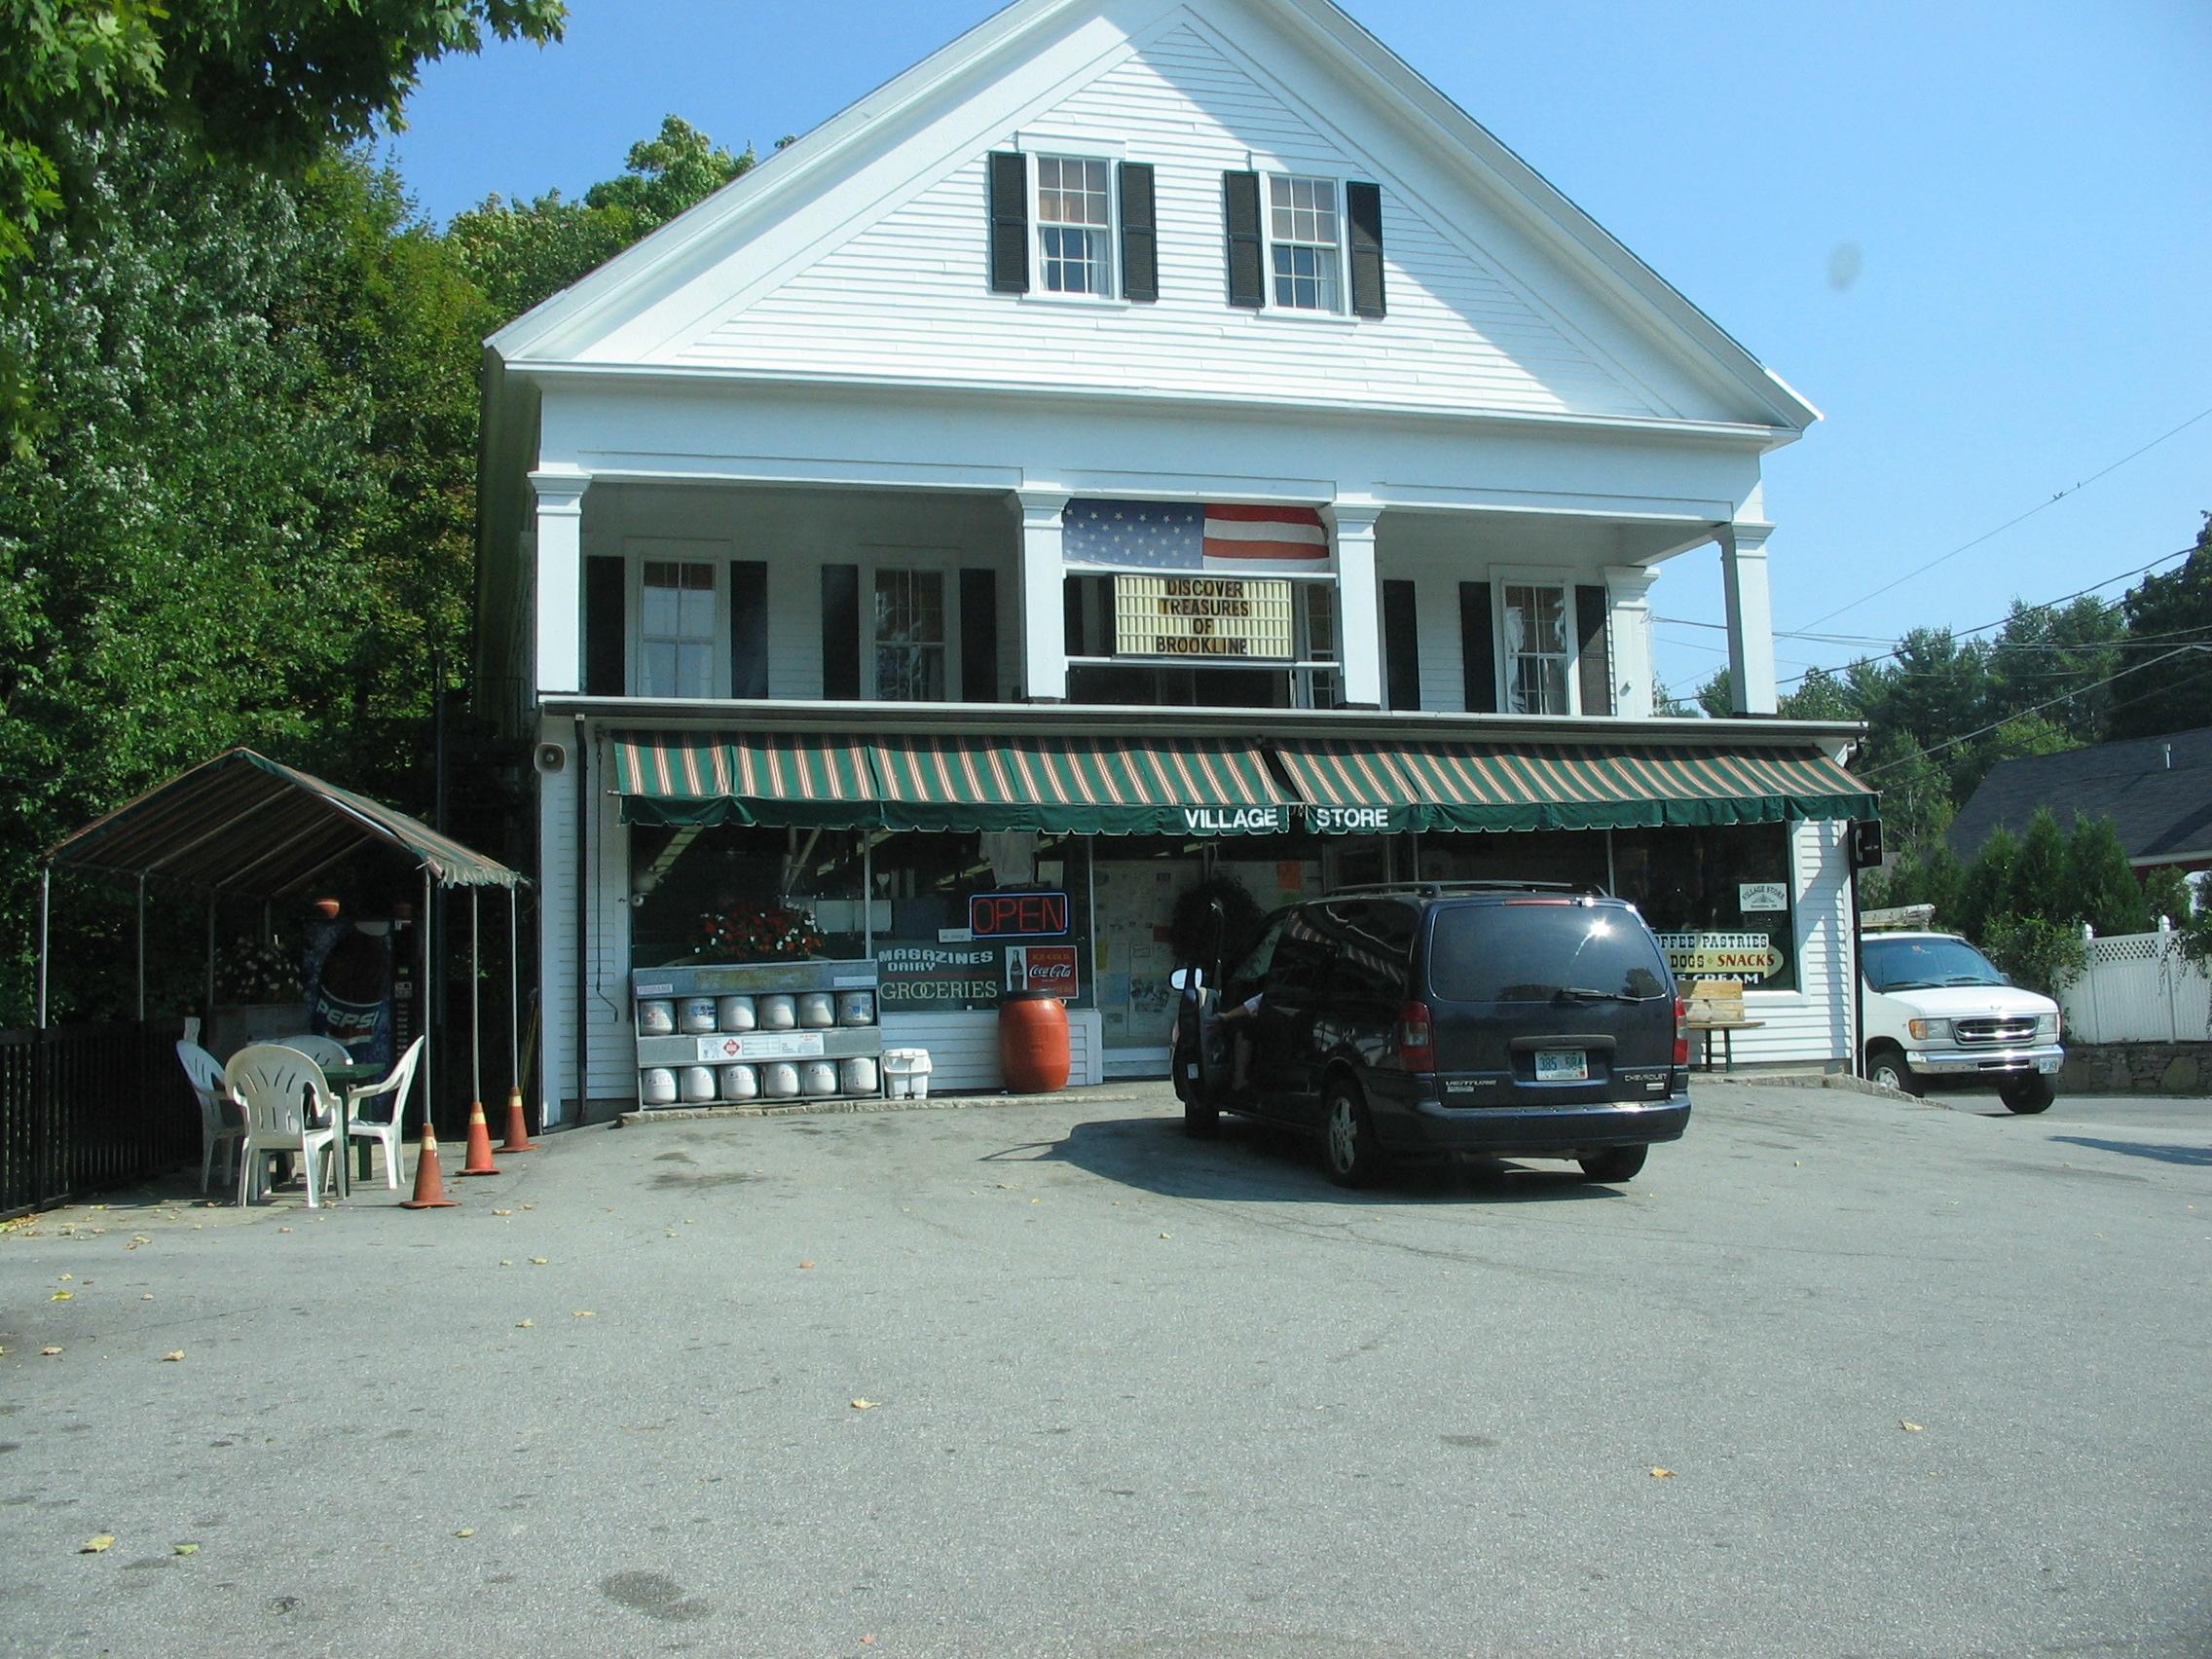 09-26-07 New Hampshire (4)